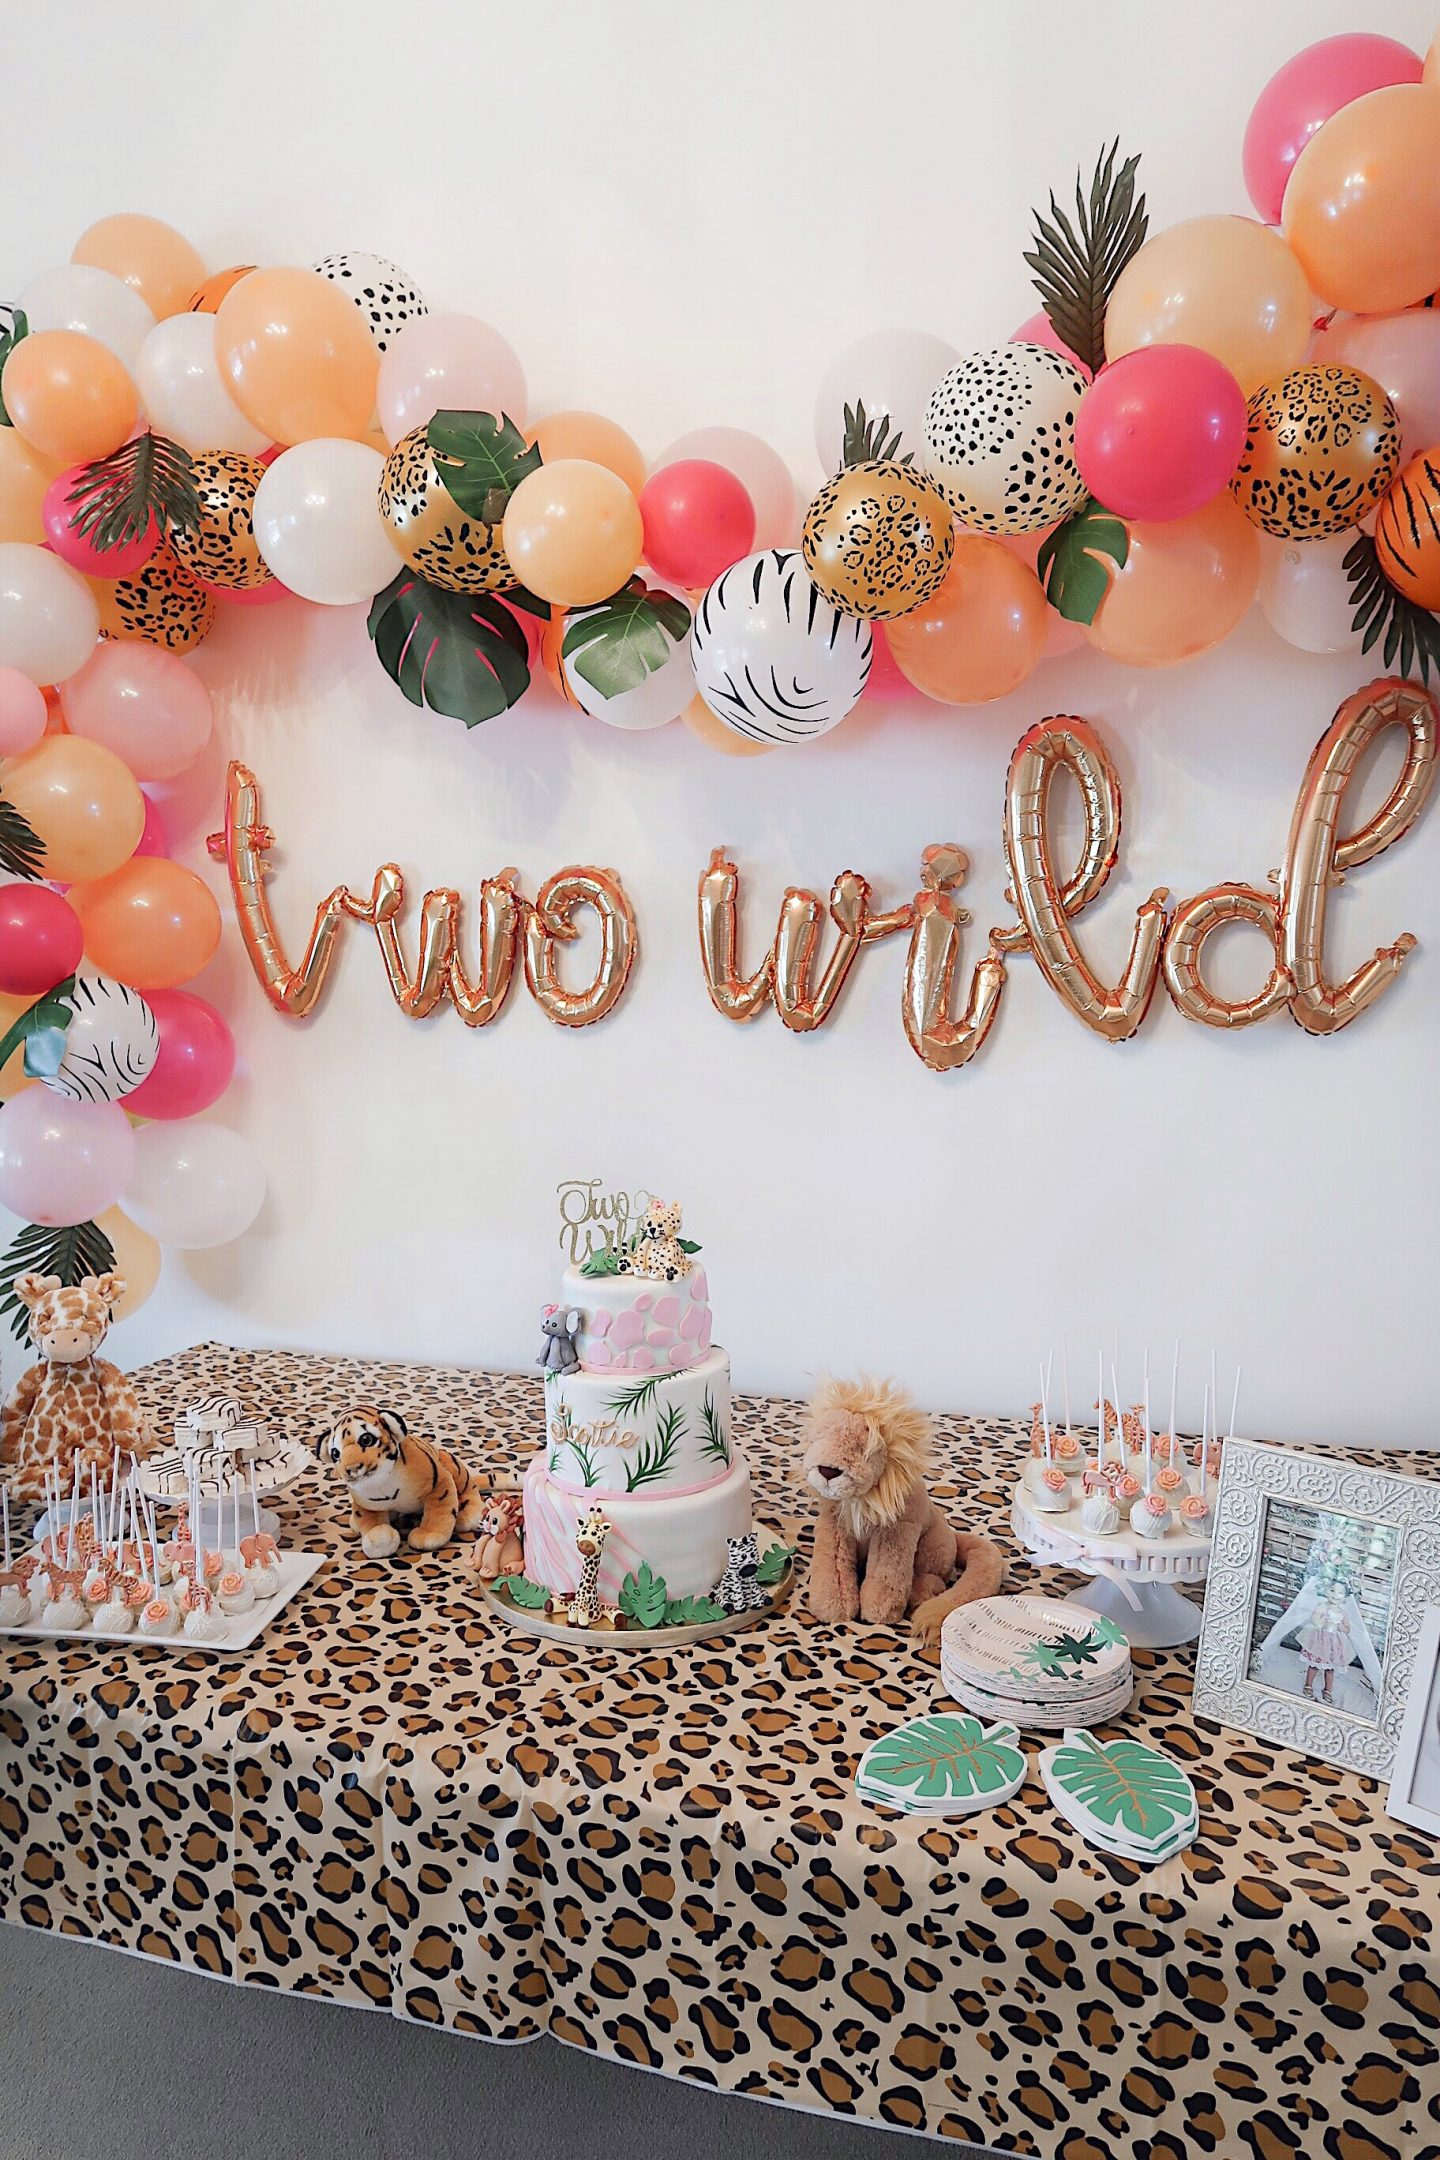 brie bemis rearick safari girl birthday party summer tropical inspiration dessert table